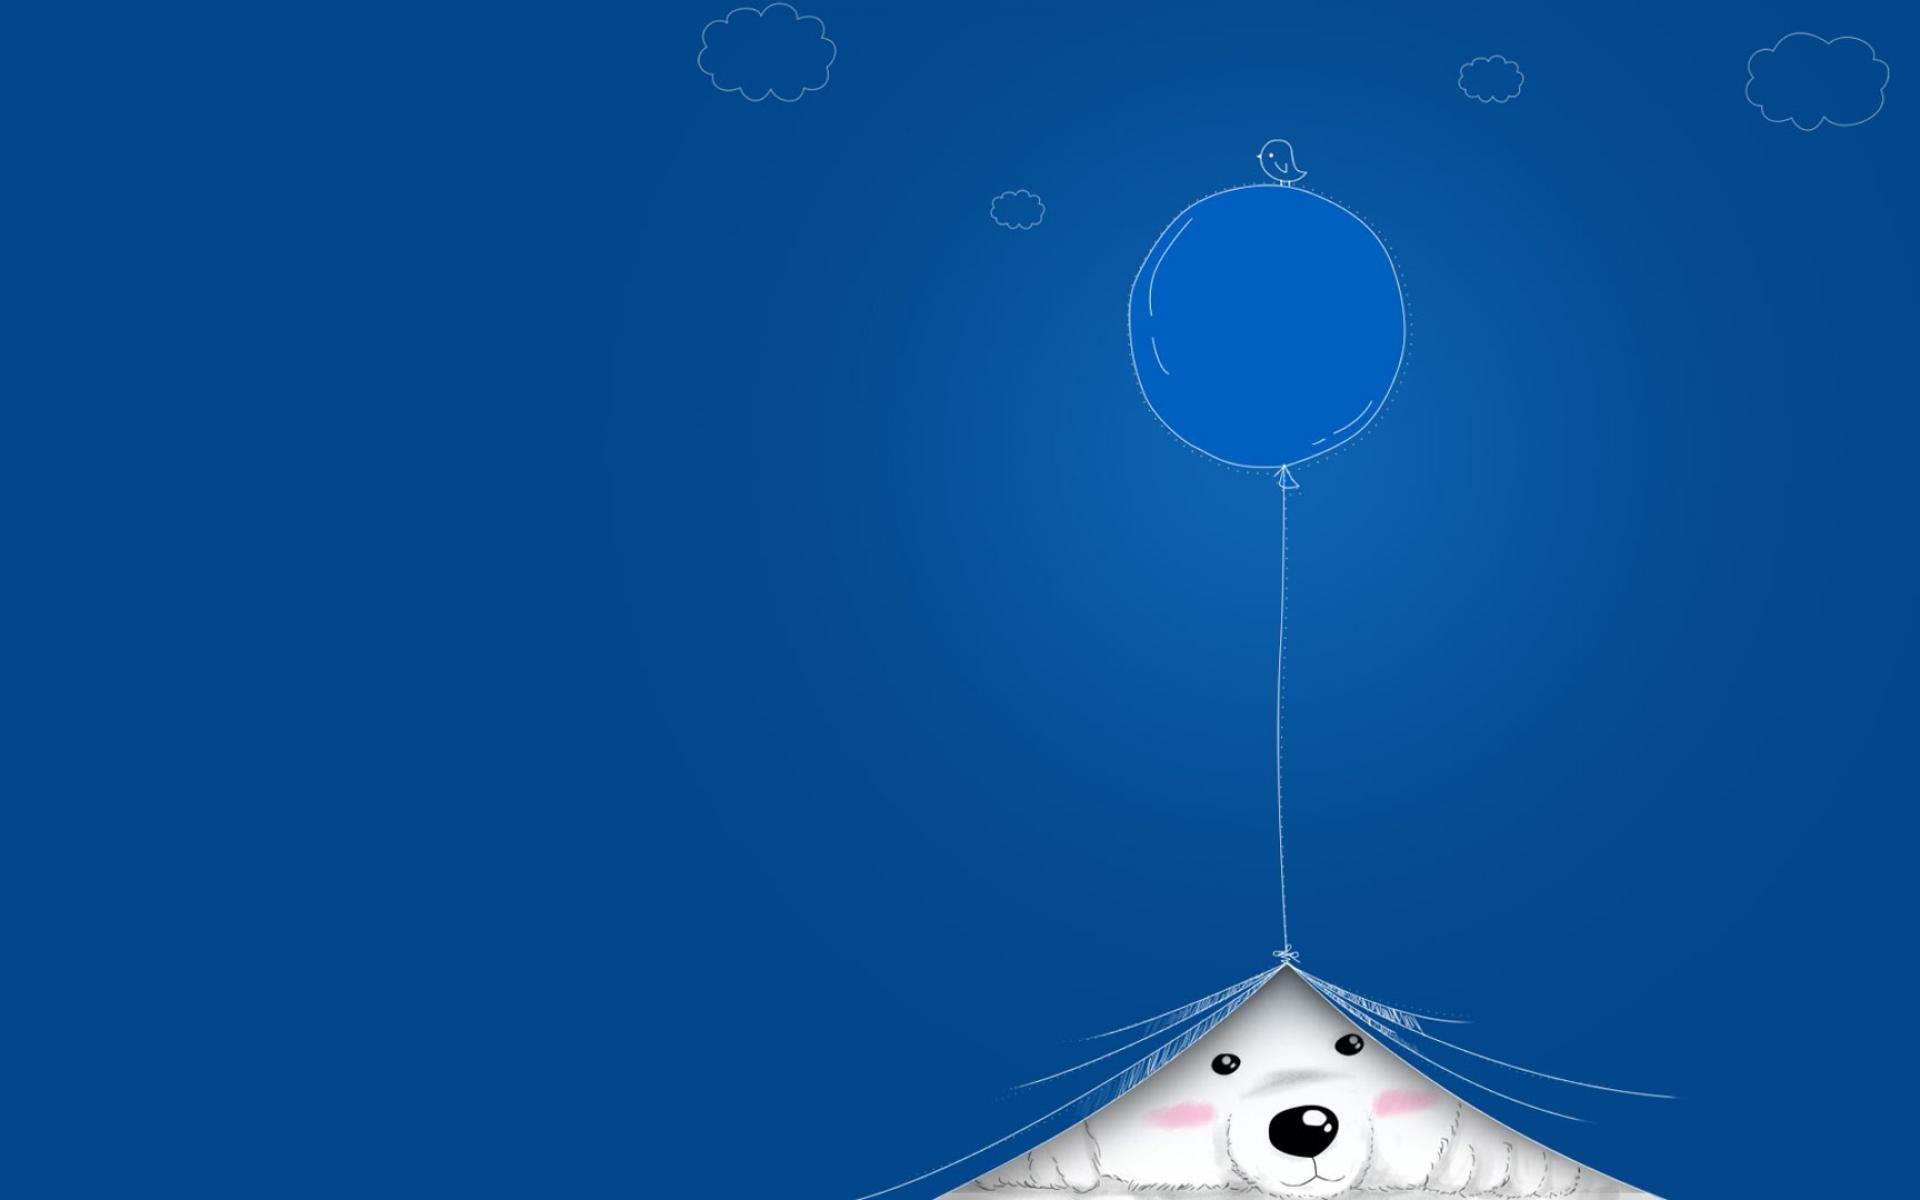 Light Blue Wallpaper HD For Desktop.